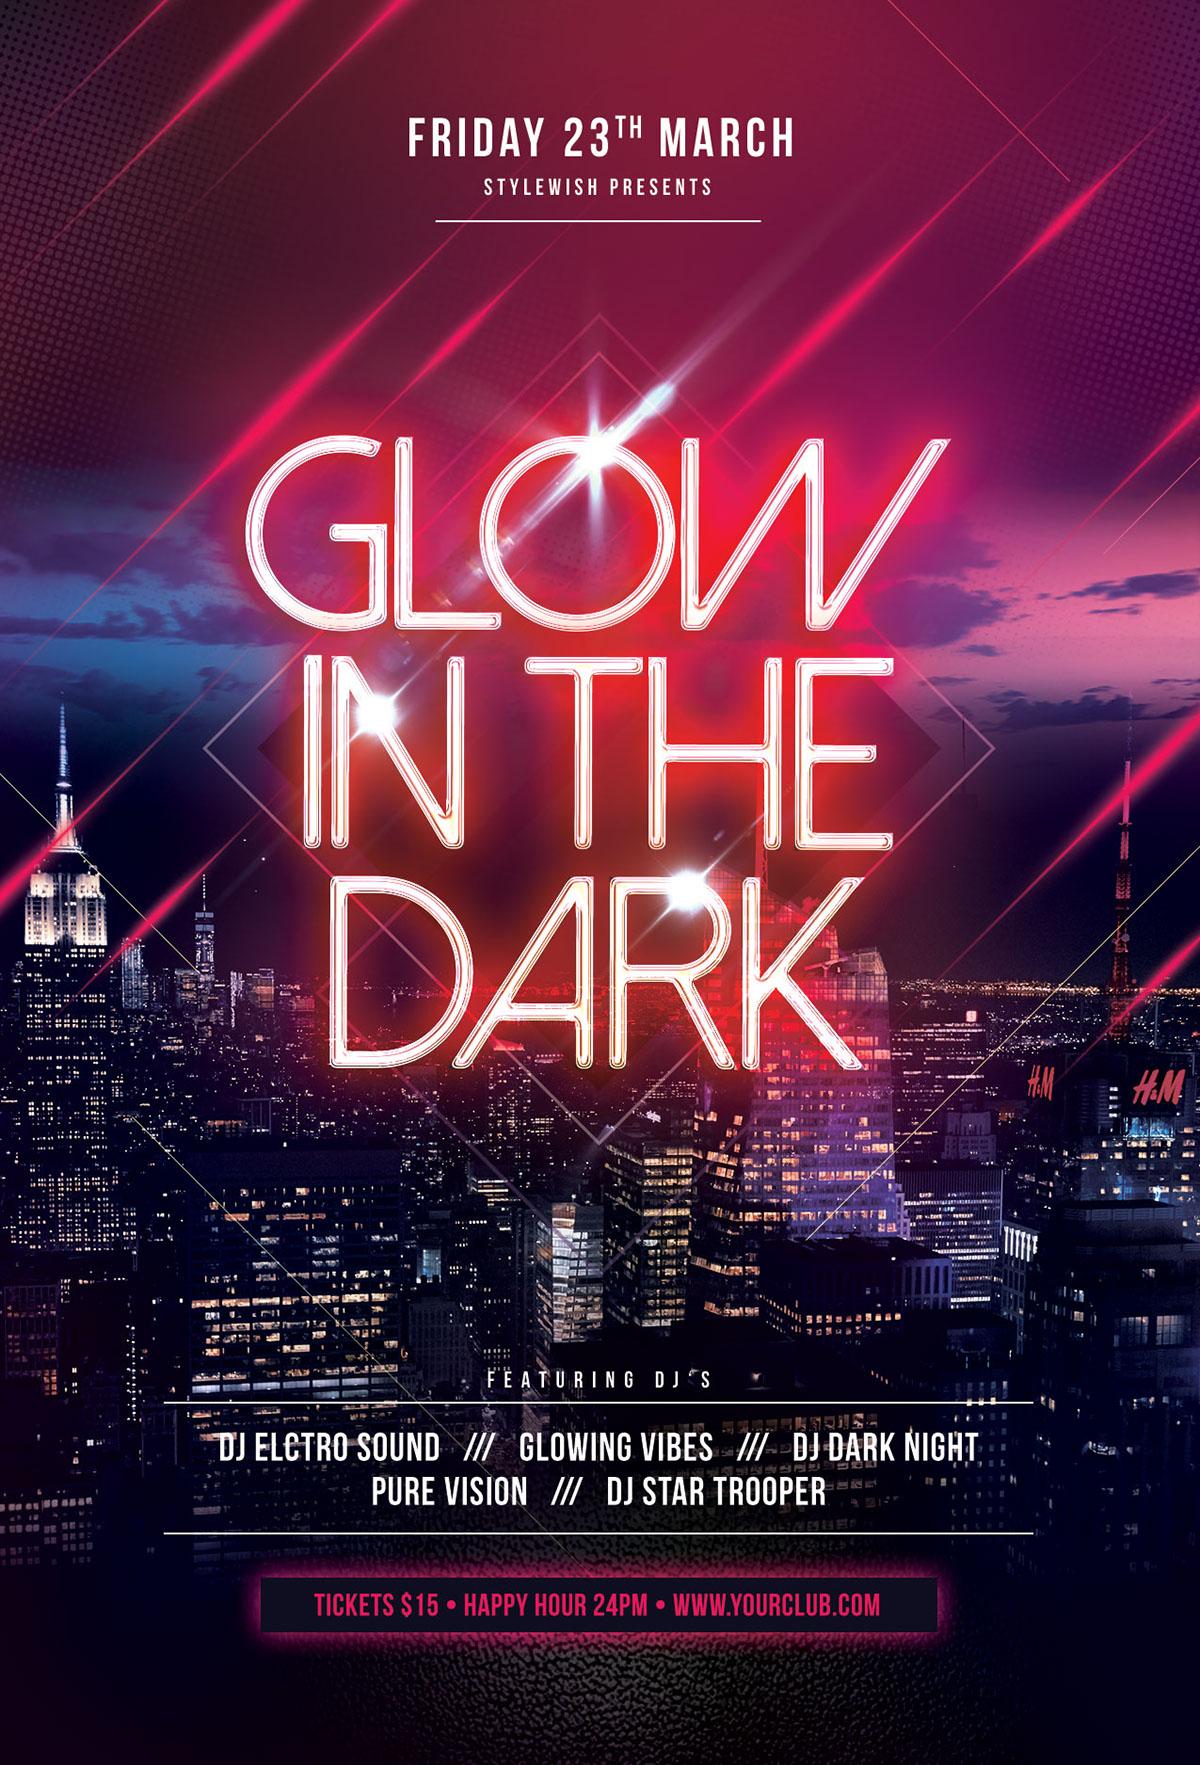 Glow In The Dark Poster Designs On Behance